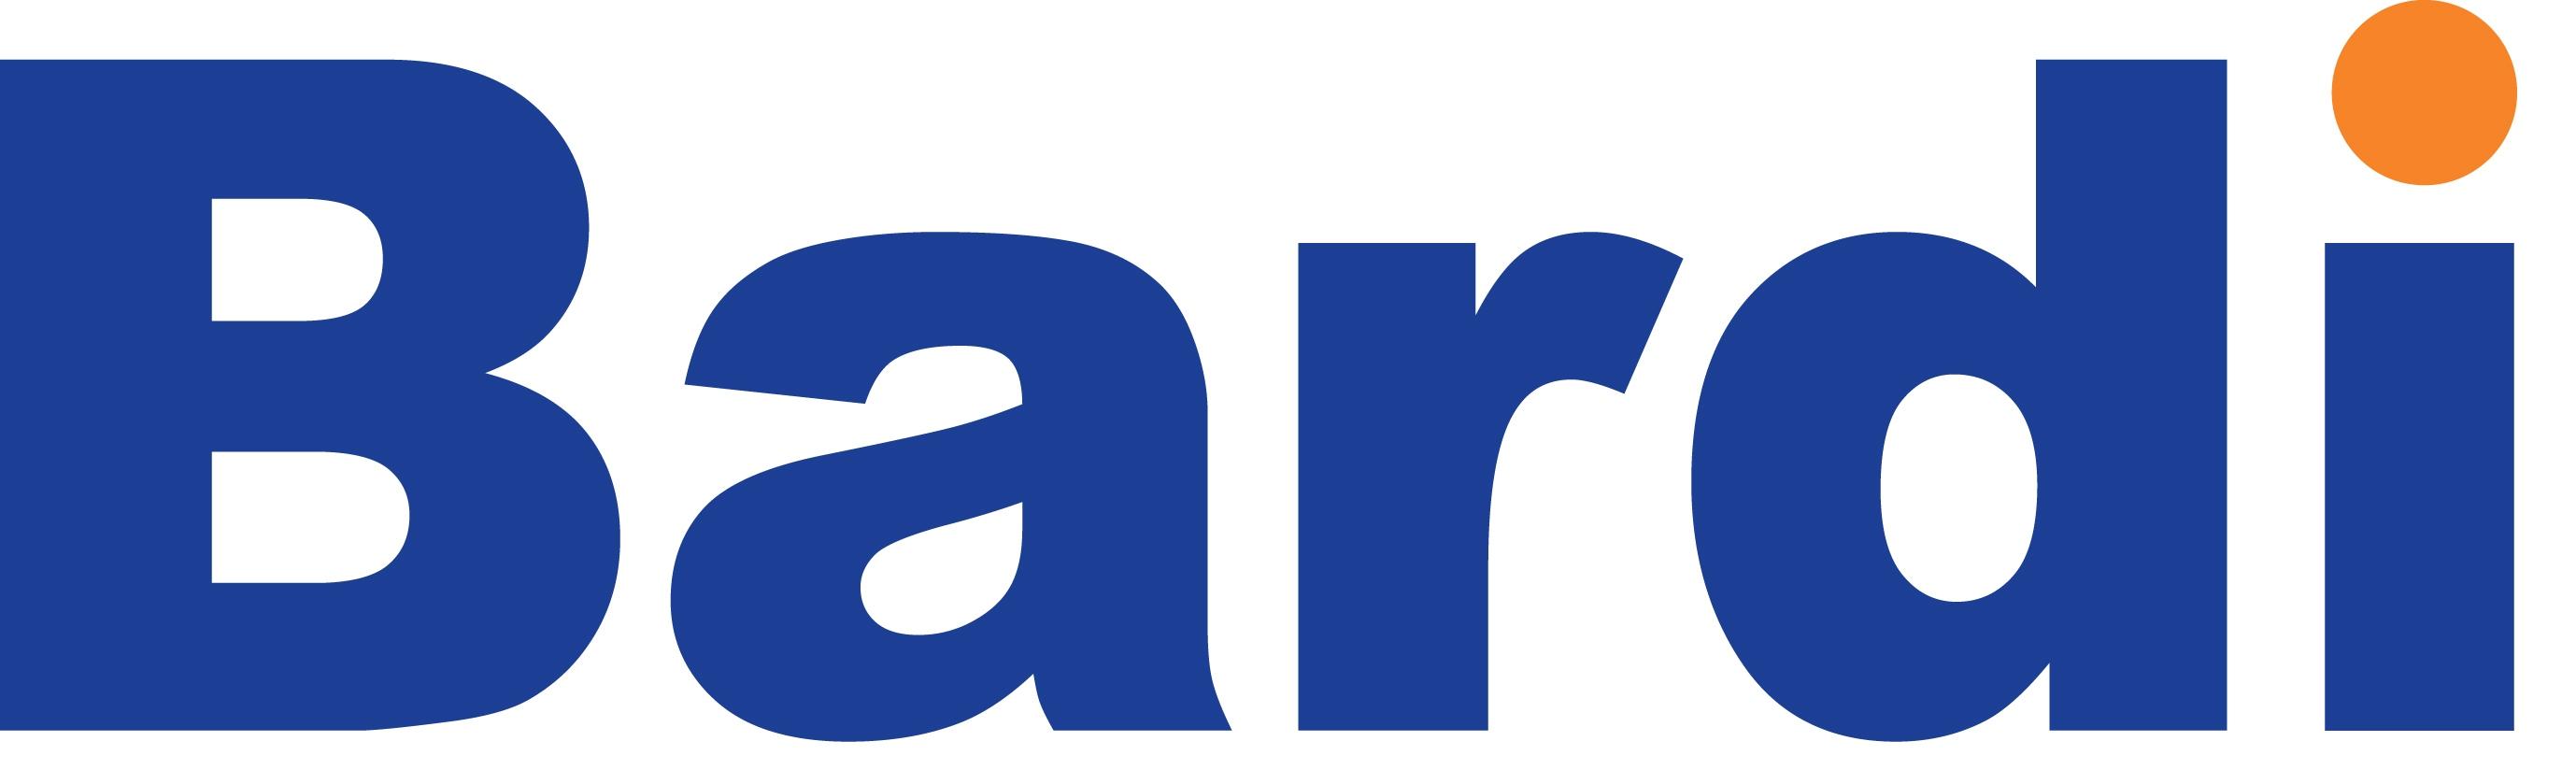 Bardi Heating & Air Conditioning, Inc. Company Logo